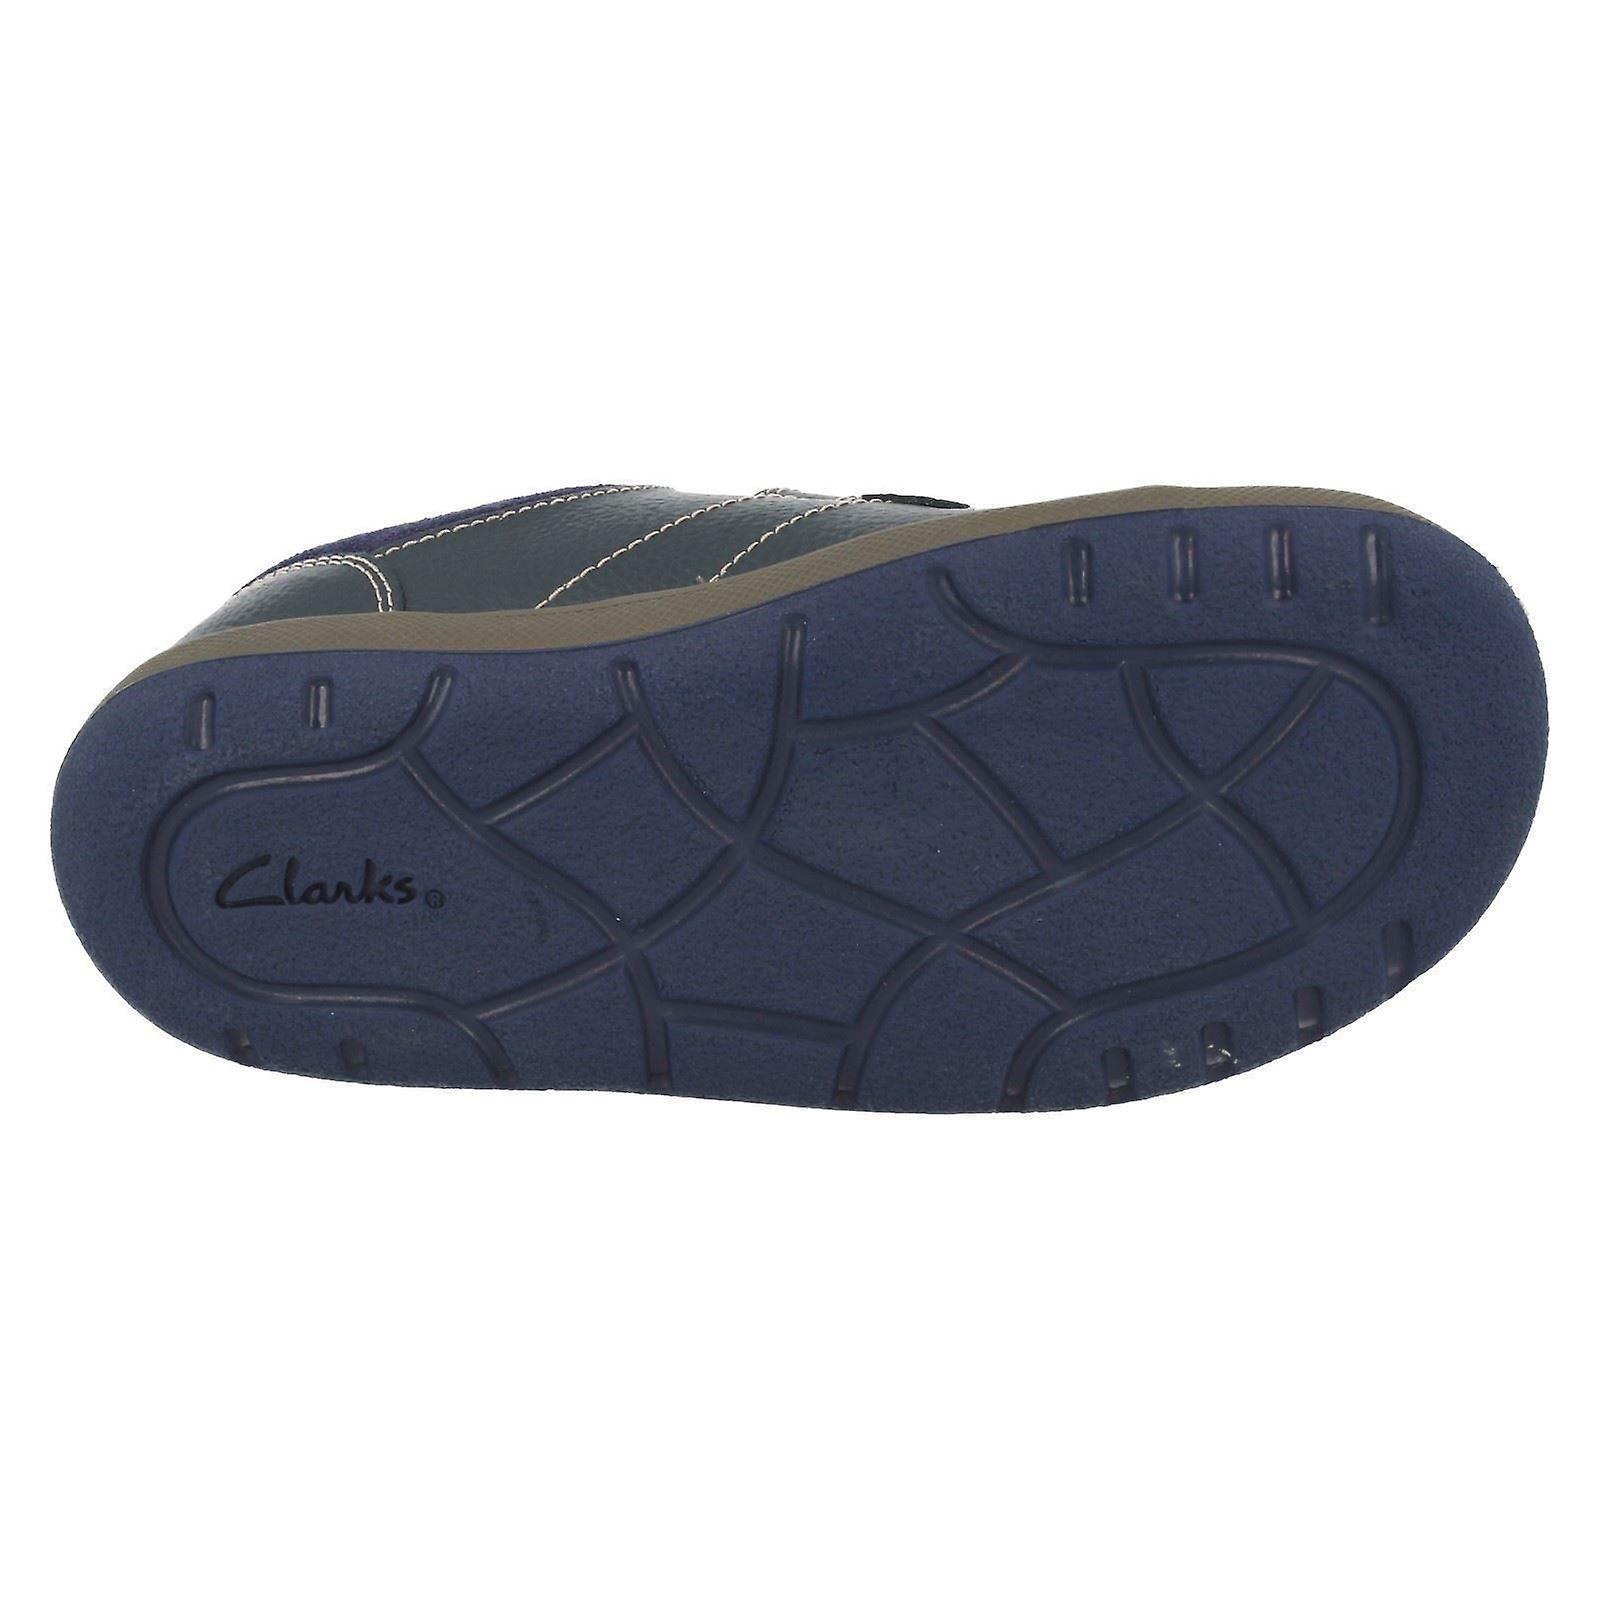 Boys Clarks Casual Shoes Maltby Pop